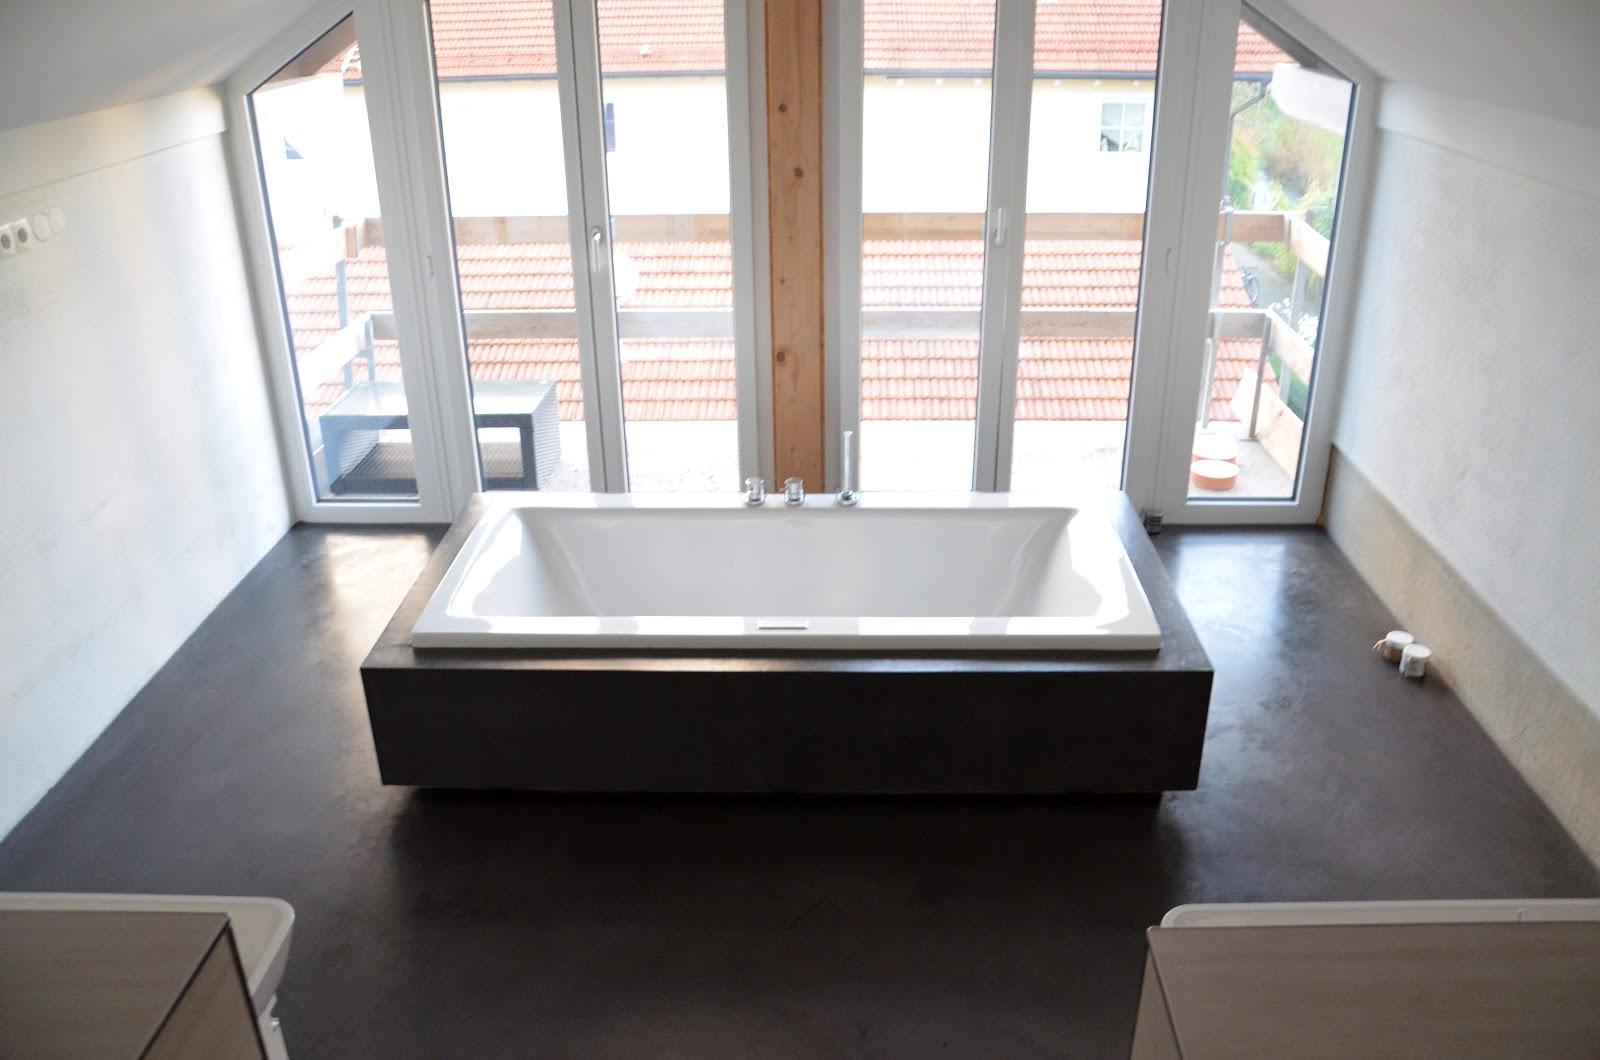 beton cire oberfl chen in beton look wannenverkleidung. Black Bedroom Furniture Sets. Home Design Ideas